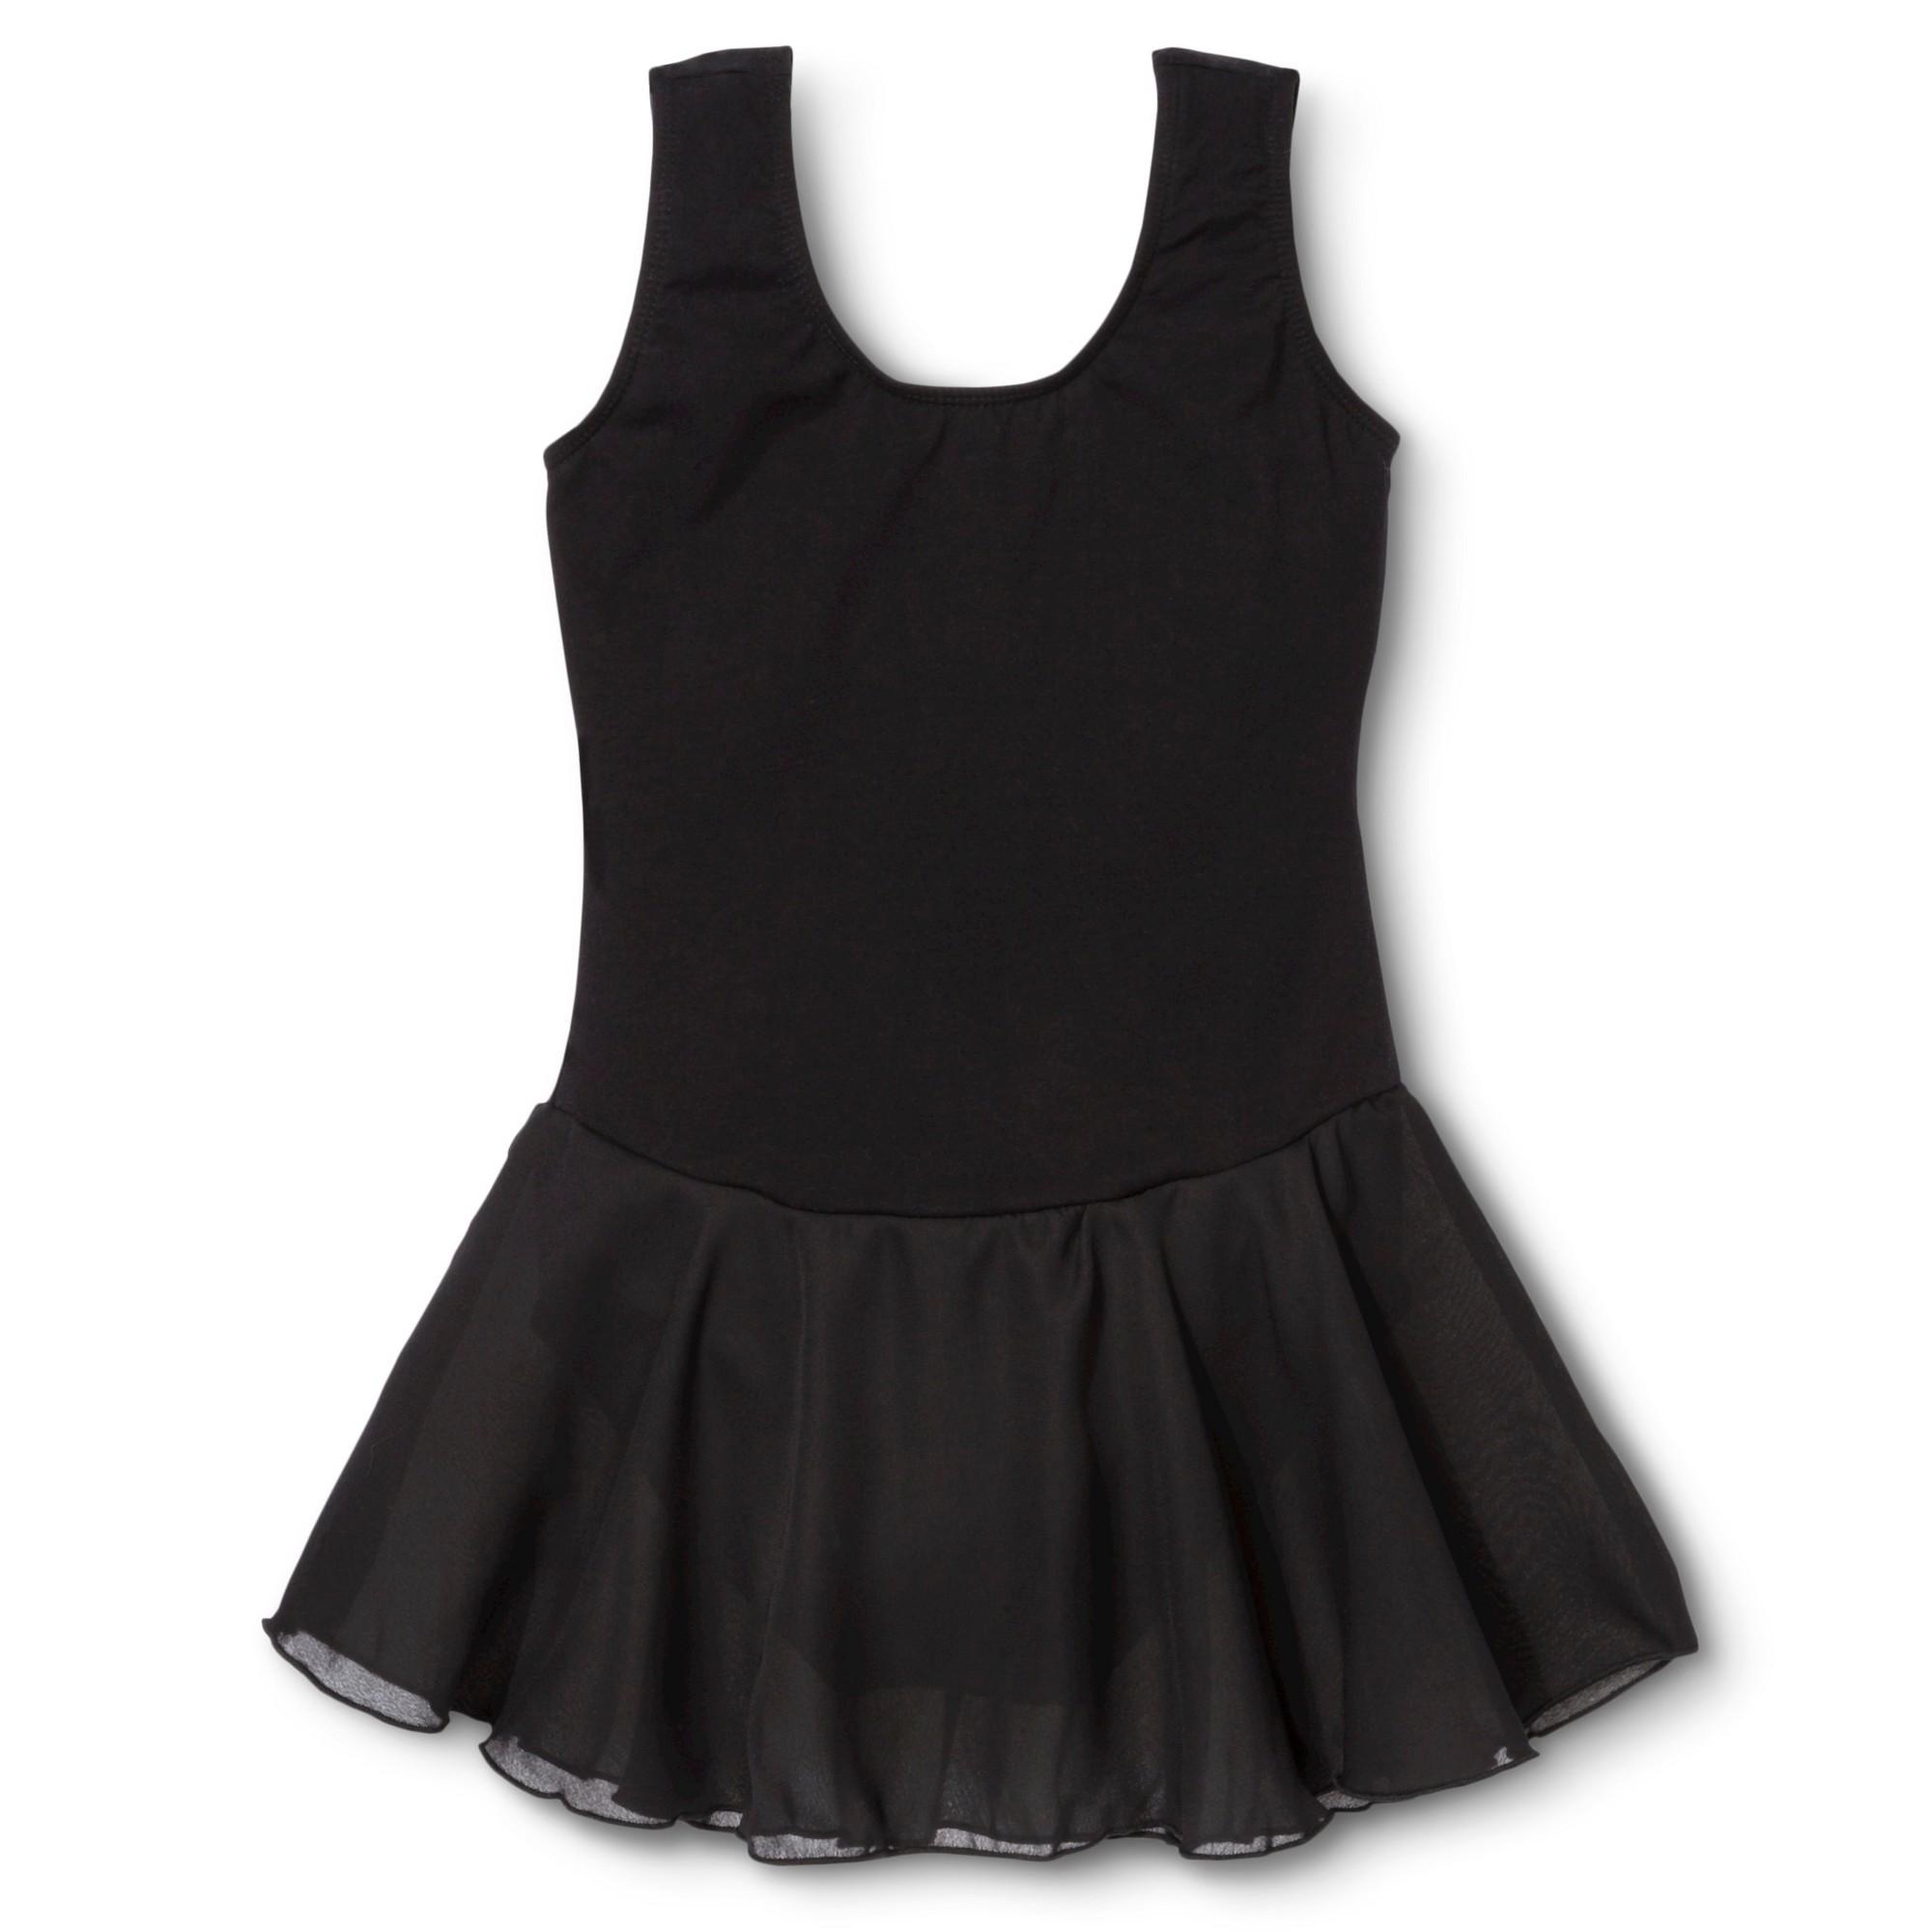 Danz N Motion Girls' Activewear Leotard Dress - Black 12-14